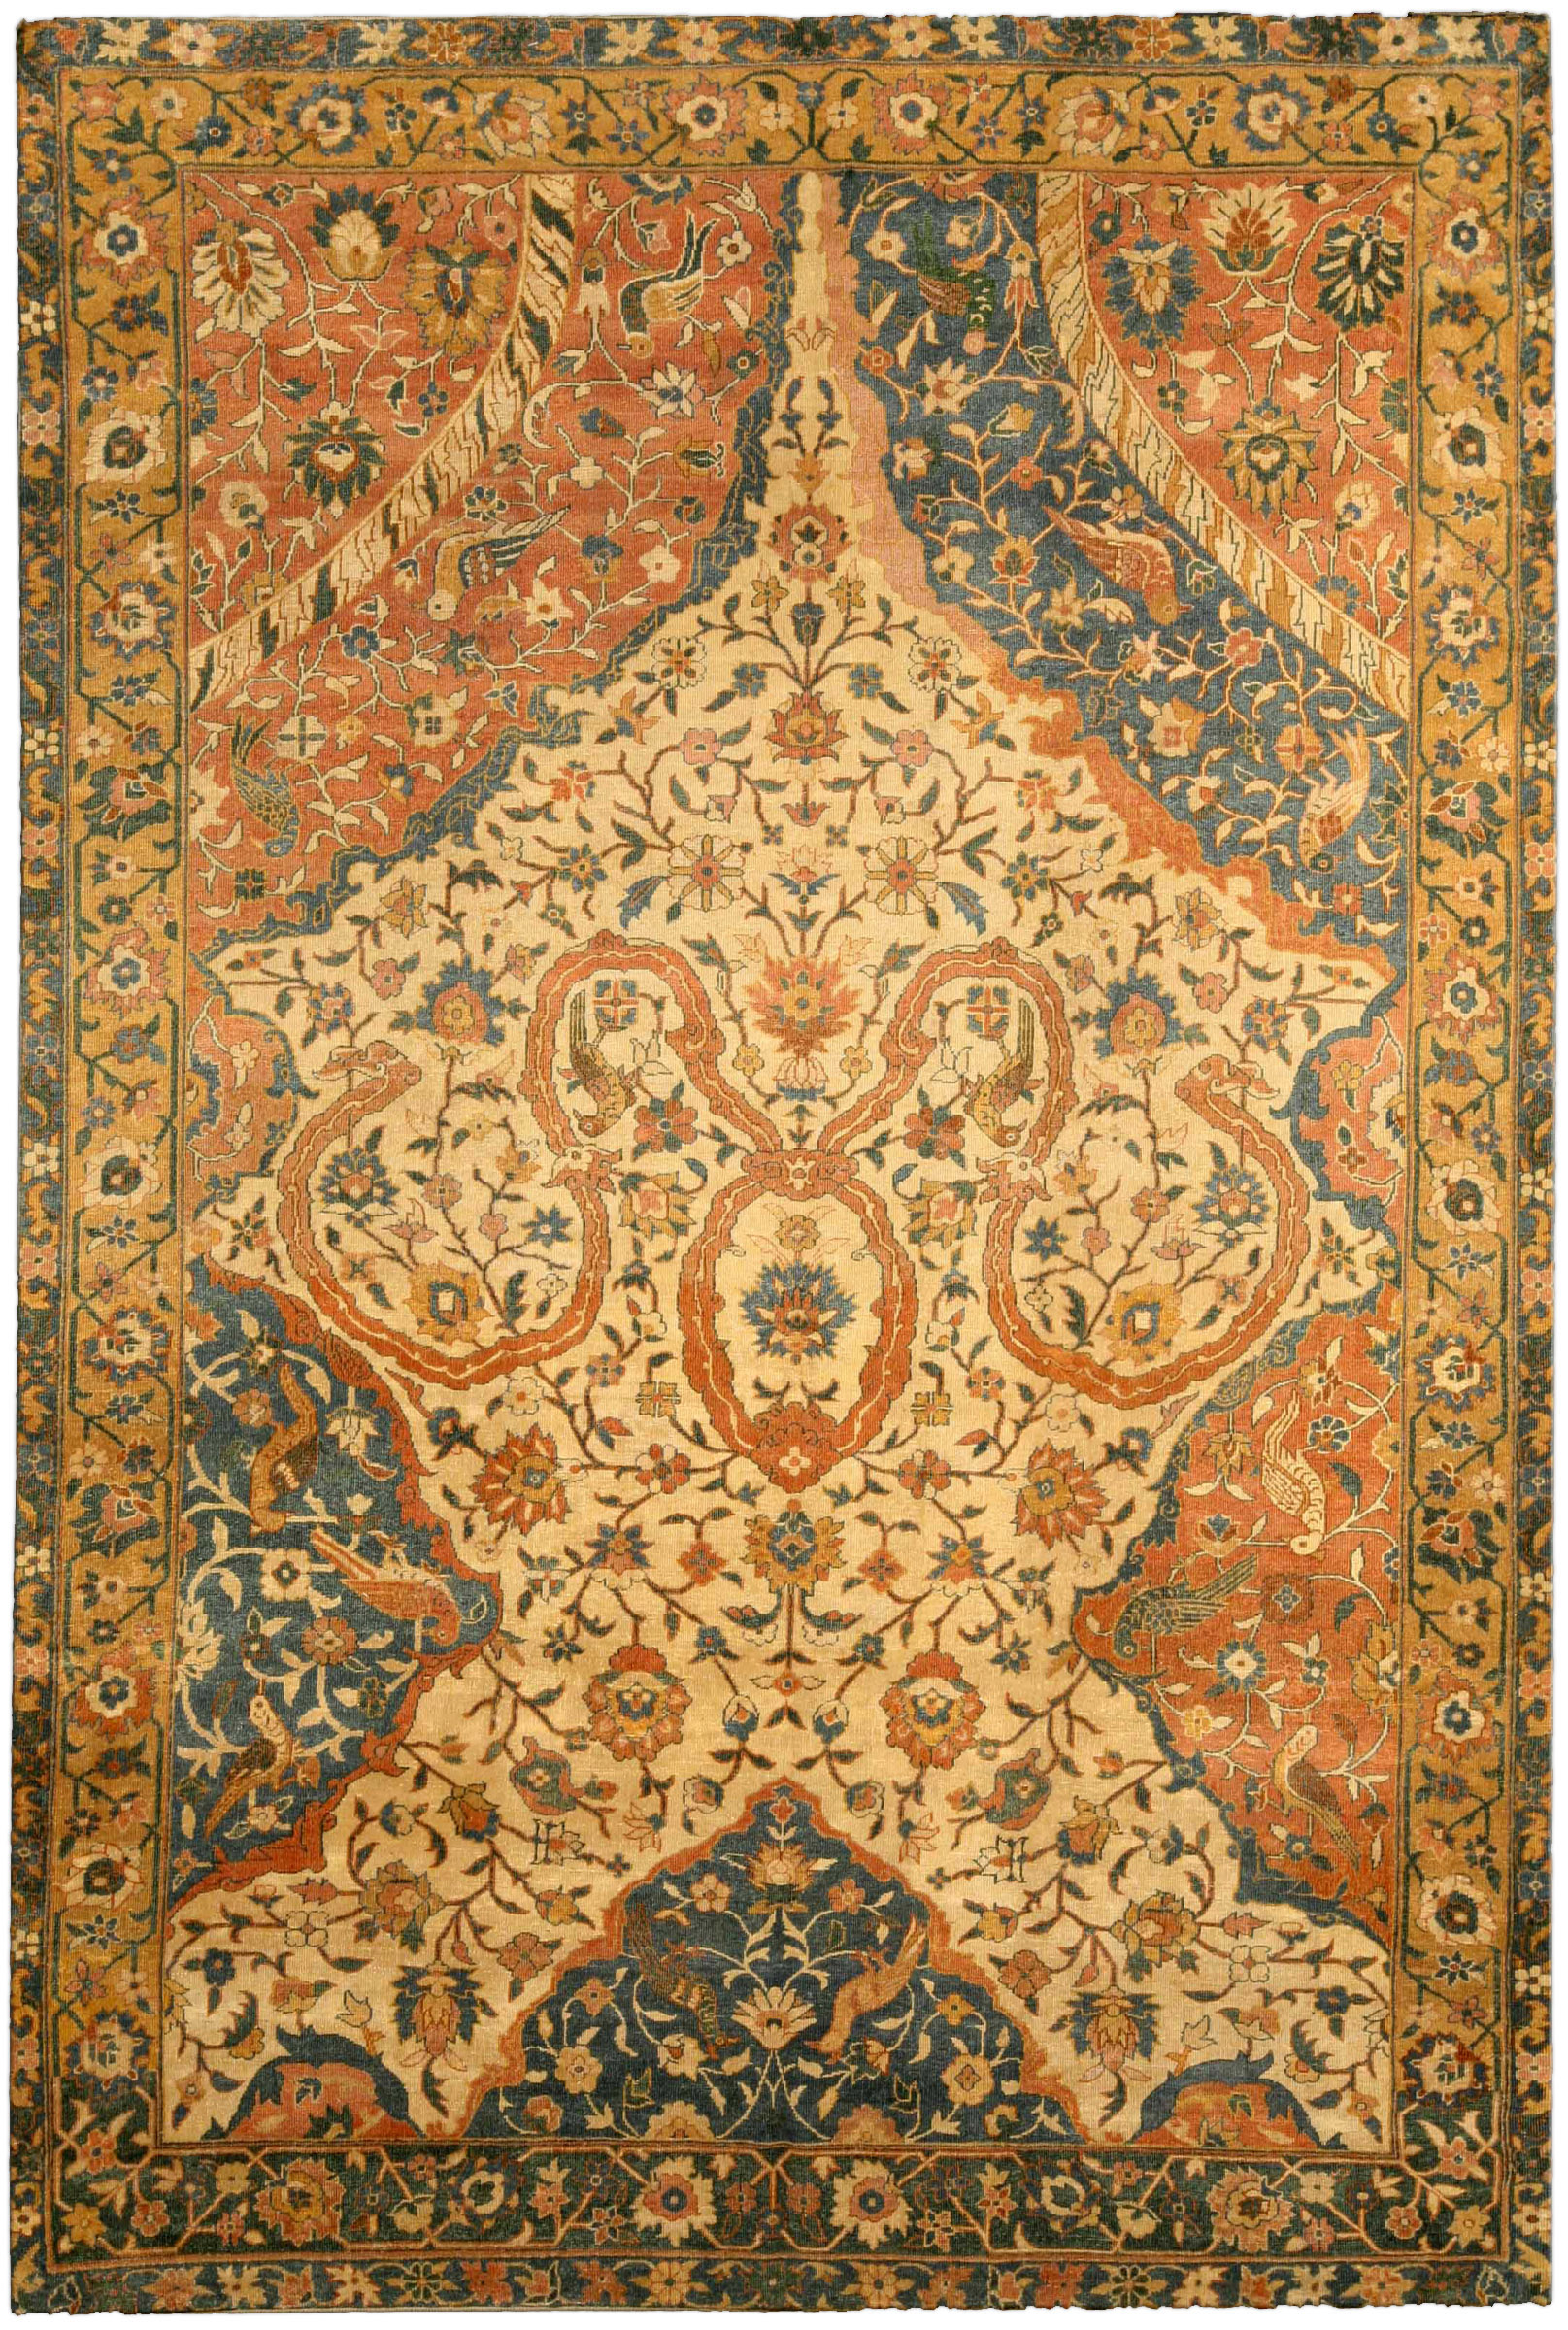 Antique Indian Carpet BB4166